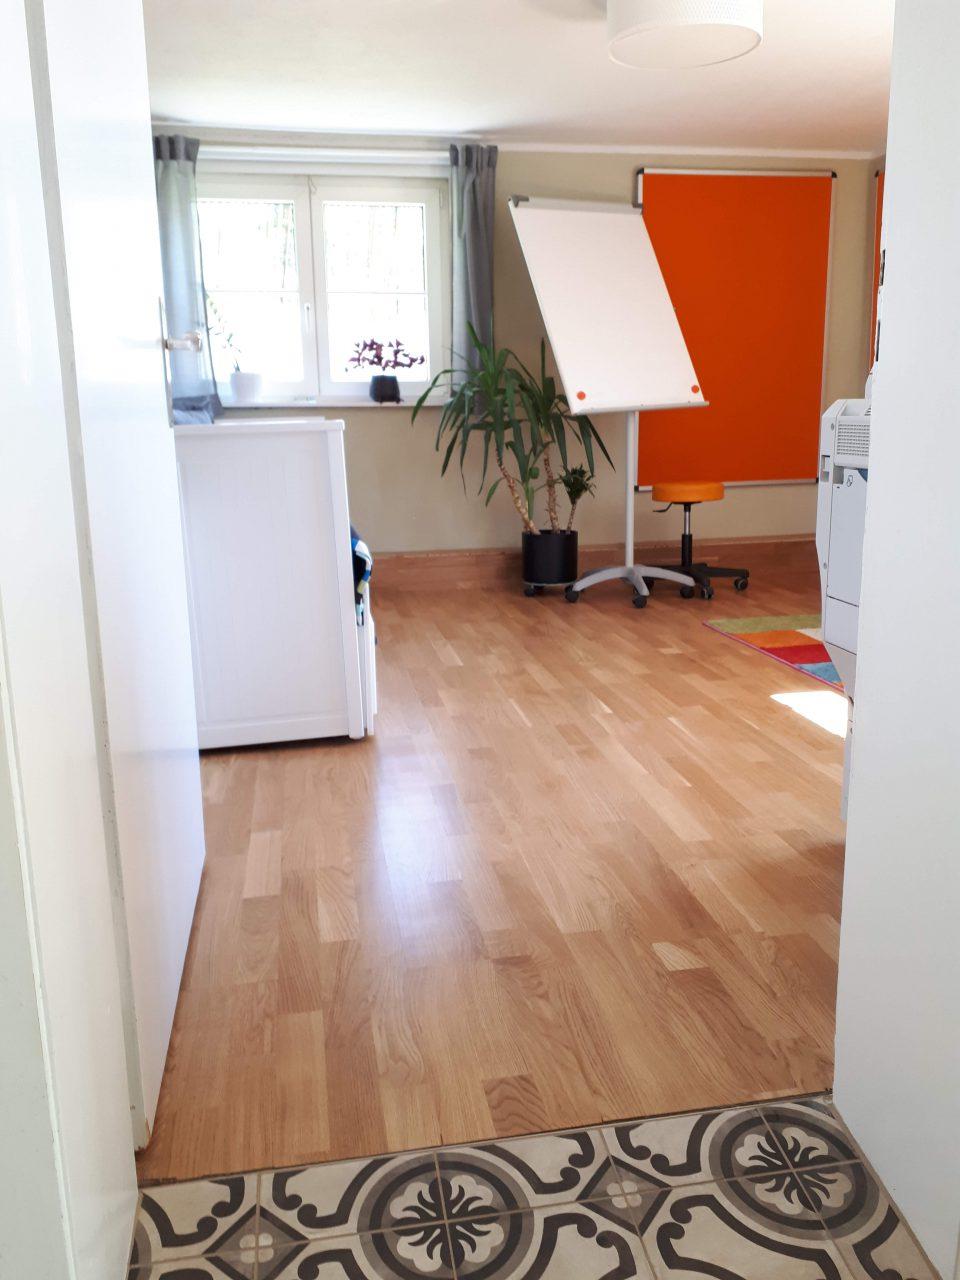 Das Büro im Kellergeschoss mit Fußbodenheizung.